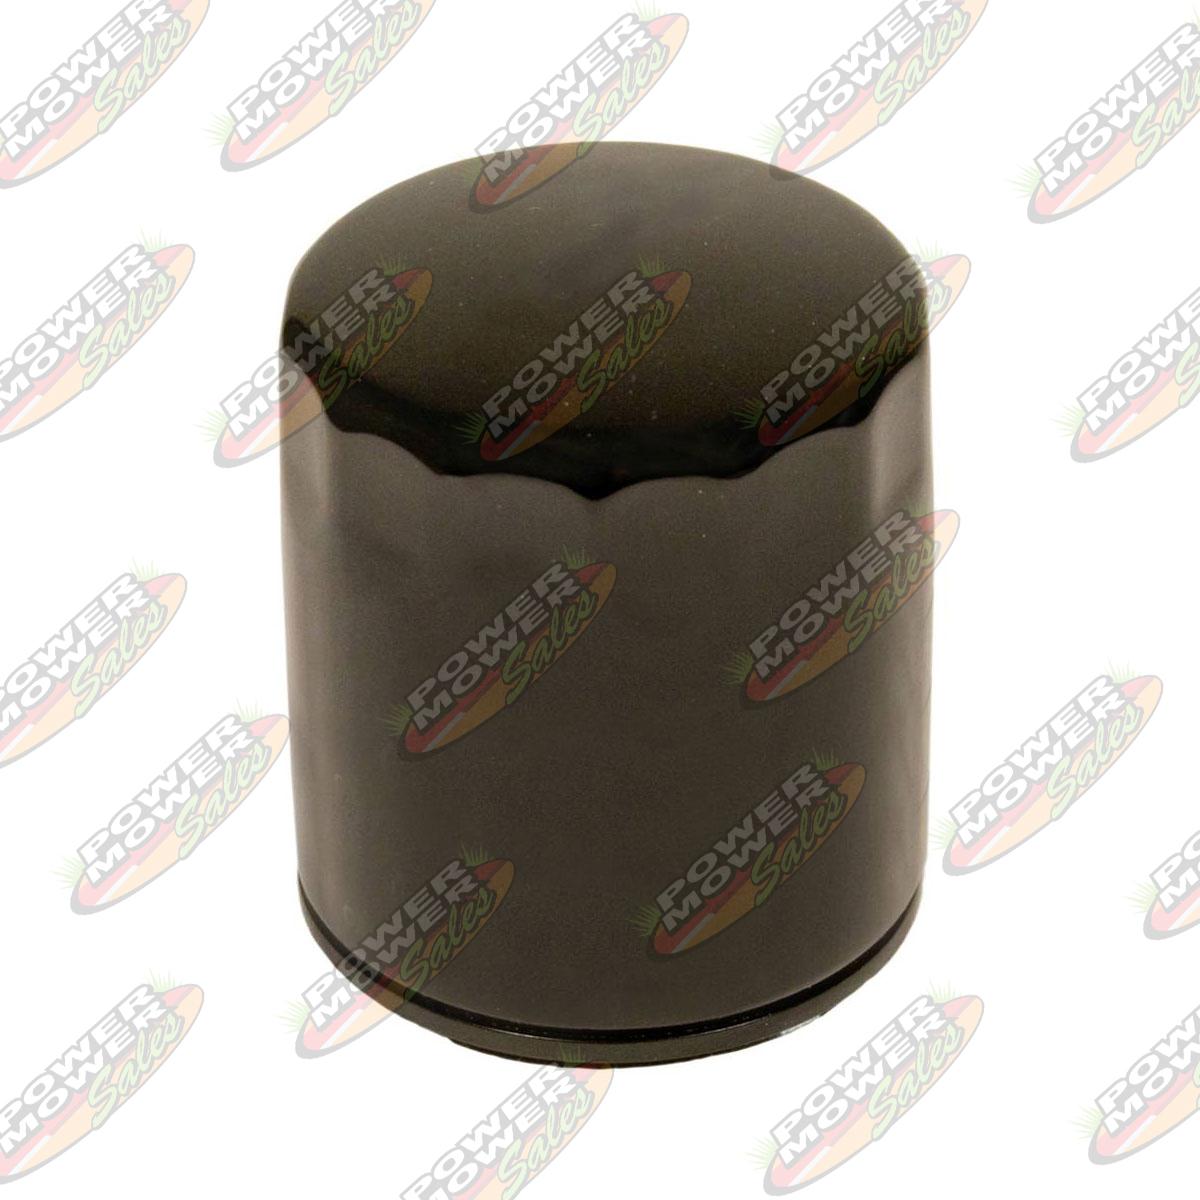 Fuel Filter Kubota 70000 43081 Power Mower Sales Filters Quick View